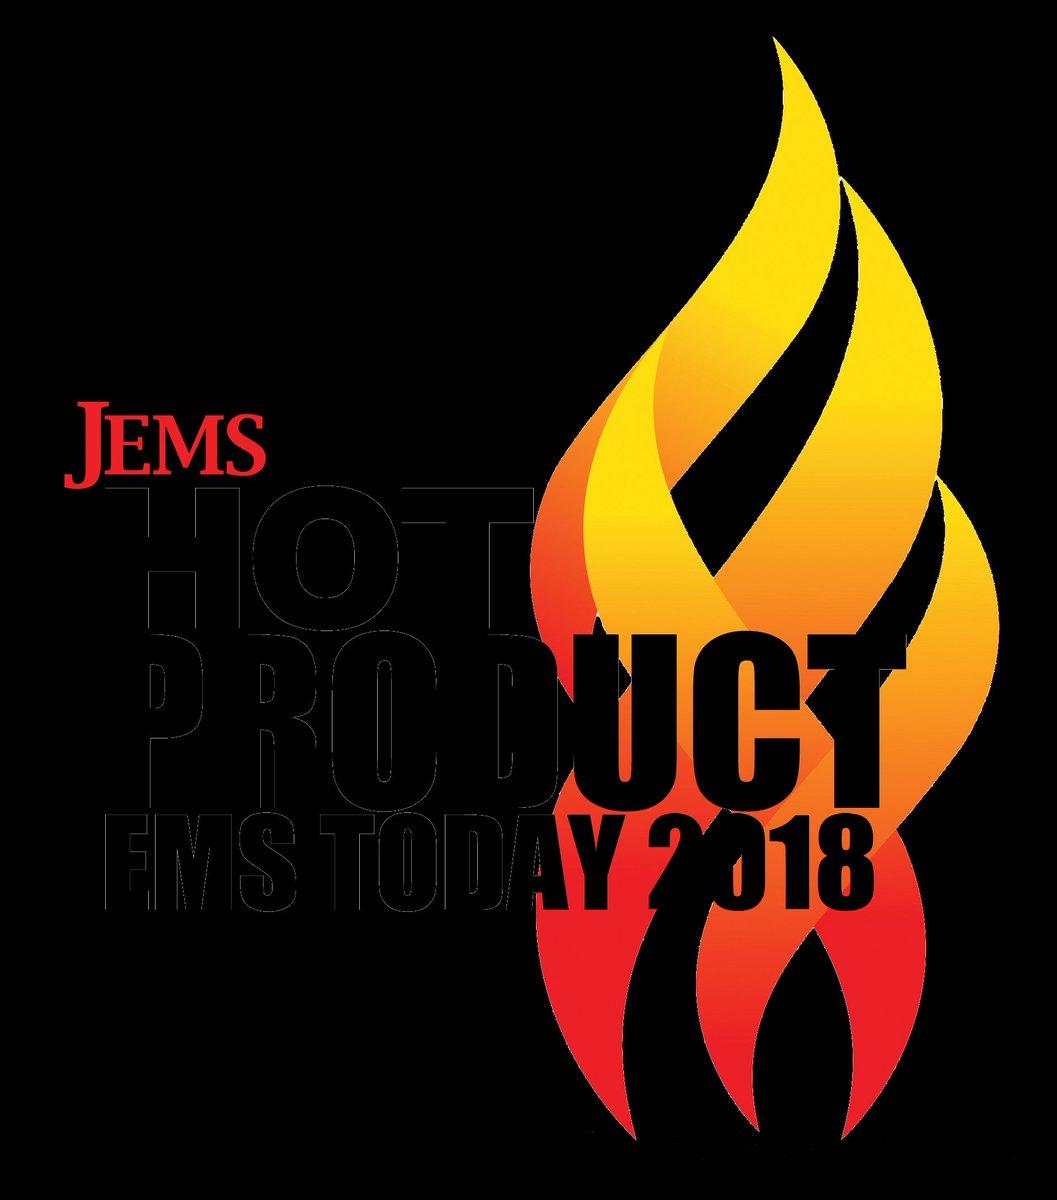 jemsconnect photo